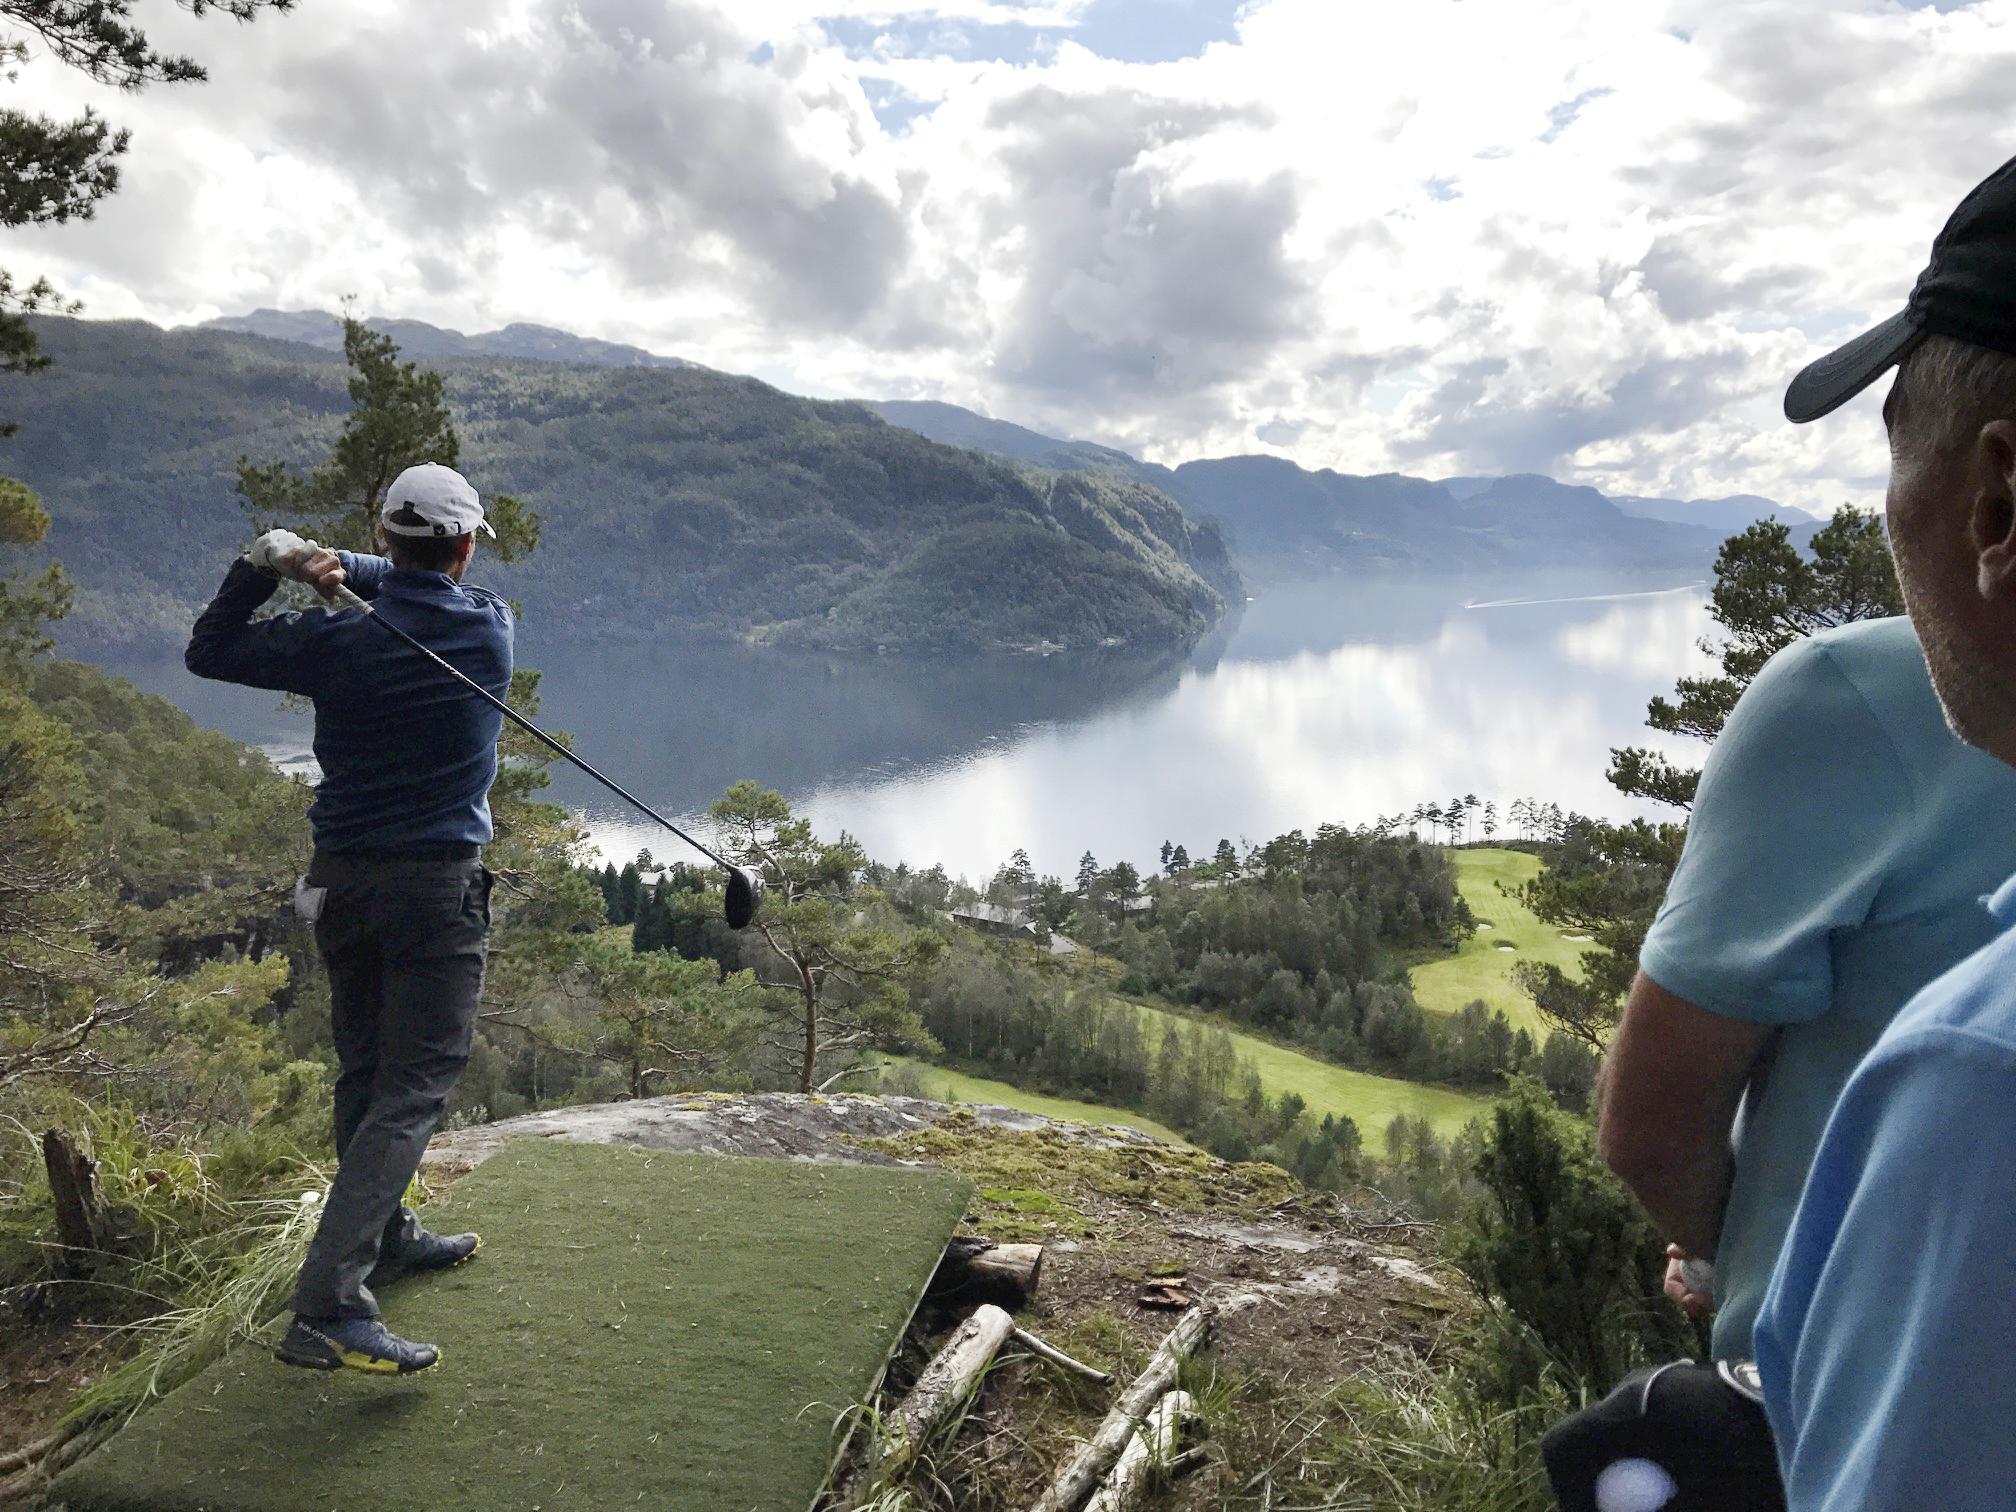 Golfspiller slår utslag under Eagle Nest Challenge 120 høydemeter over golfbane.